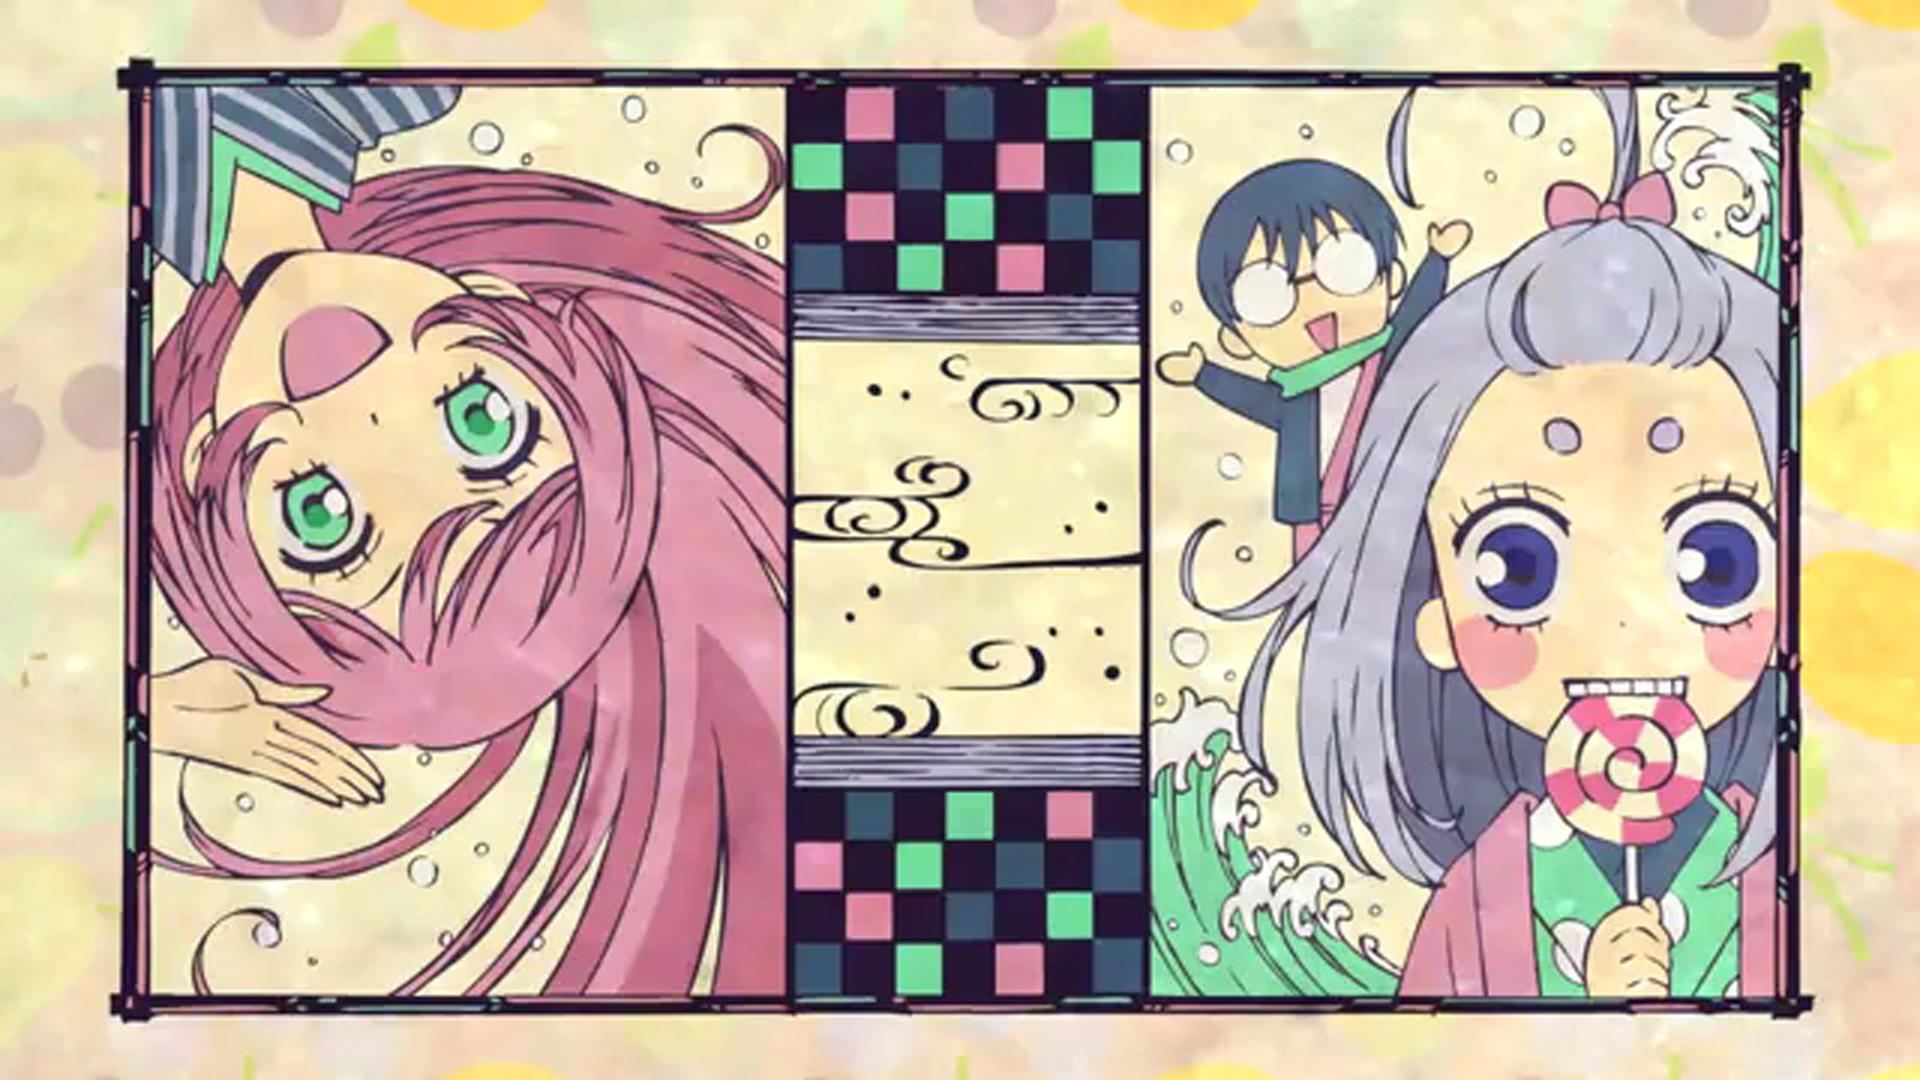 Kamisama Hajimemashita II (7) by ng9 on DeviantArt